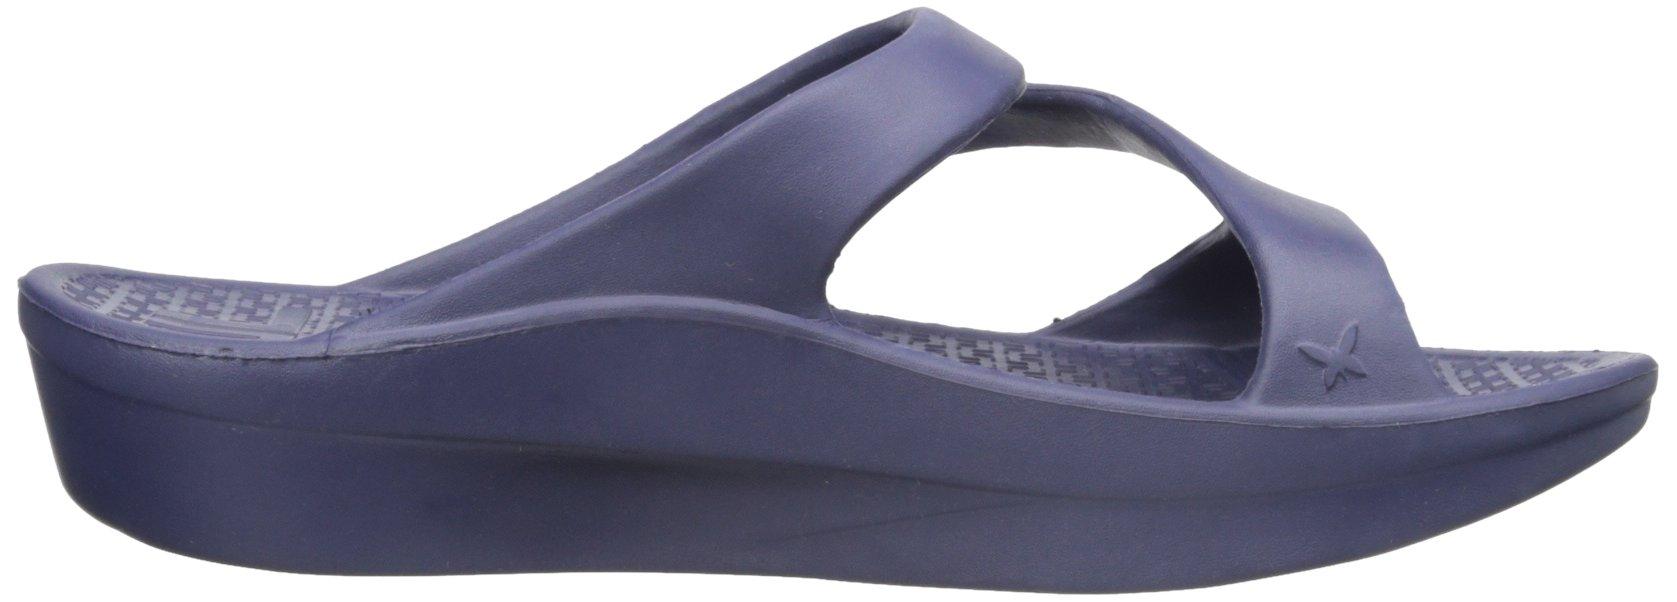 f93f5050f8eb Telic Z-Strap Soft Sandal Shoe Footwear by